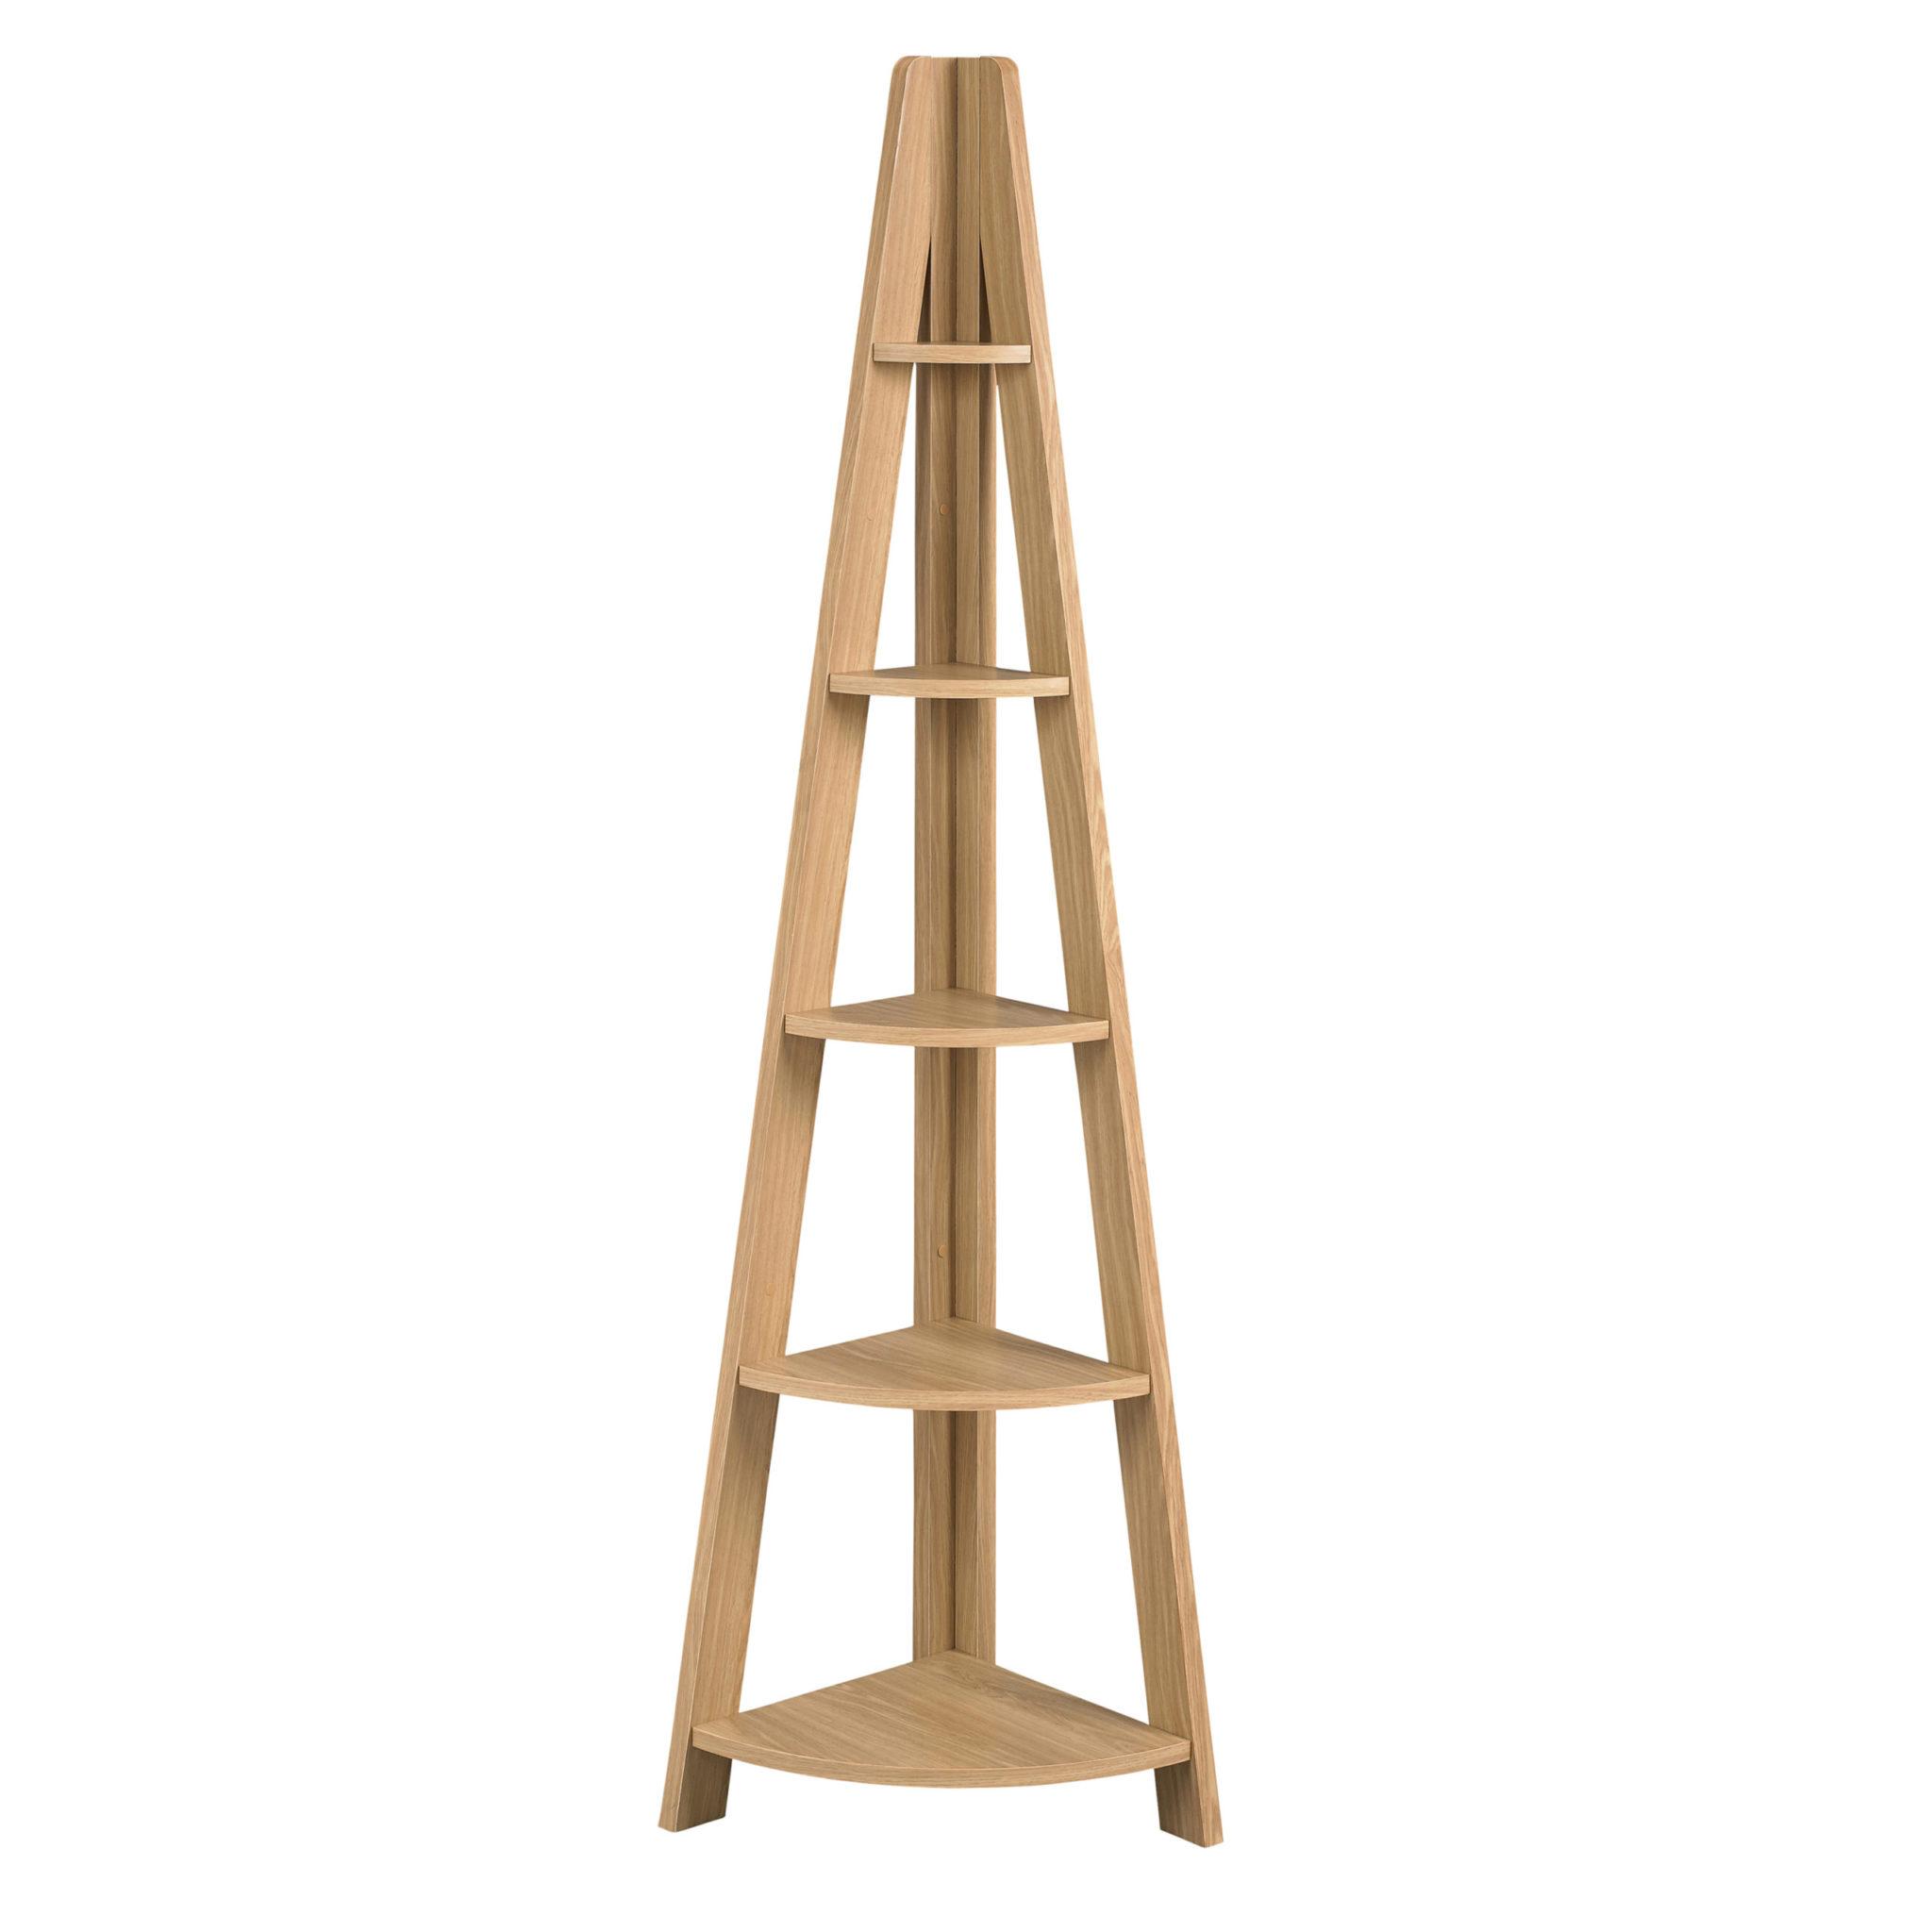 Toddny Corner Ladder Shelving Oak